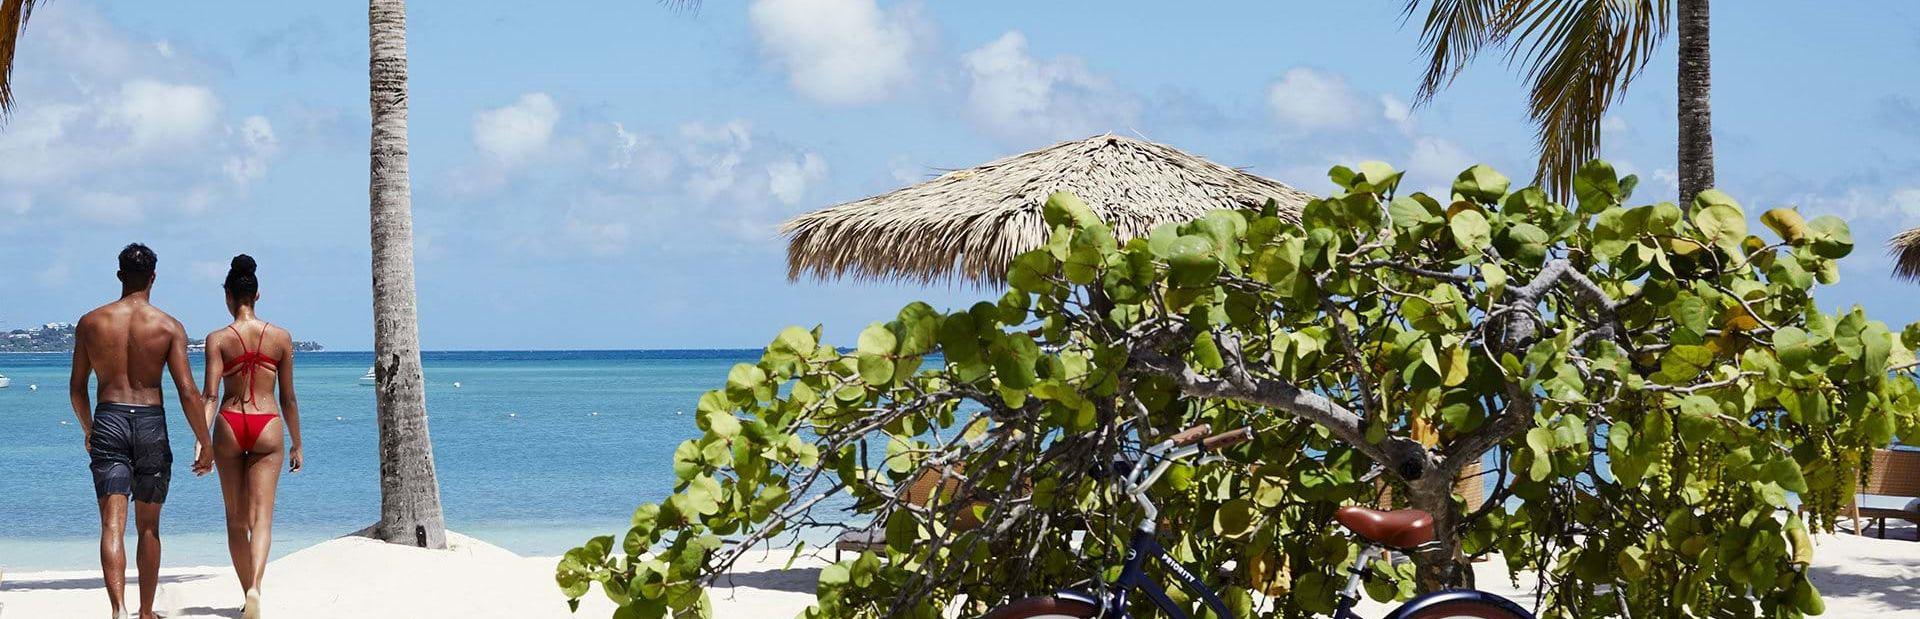 Jumby Bay Island, Antigua Image 1